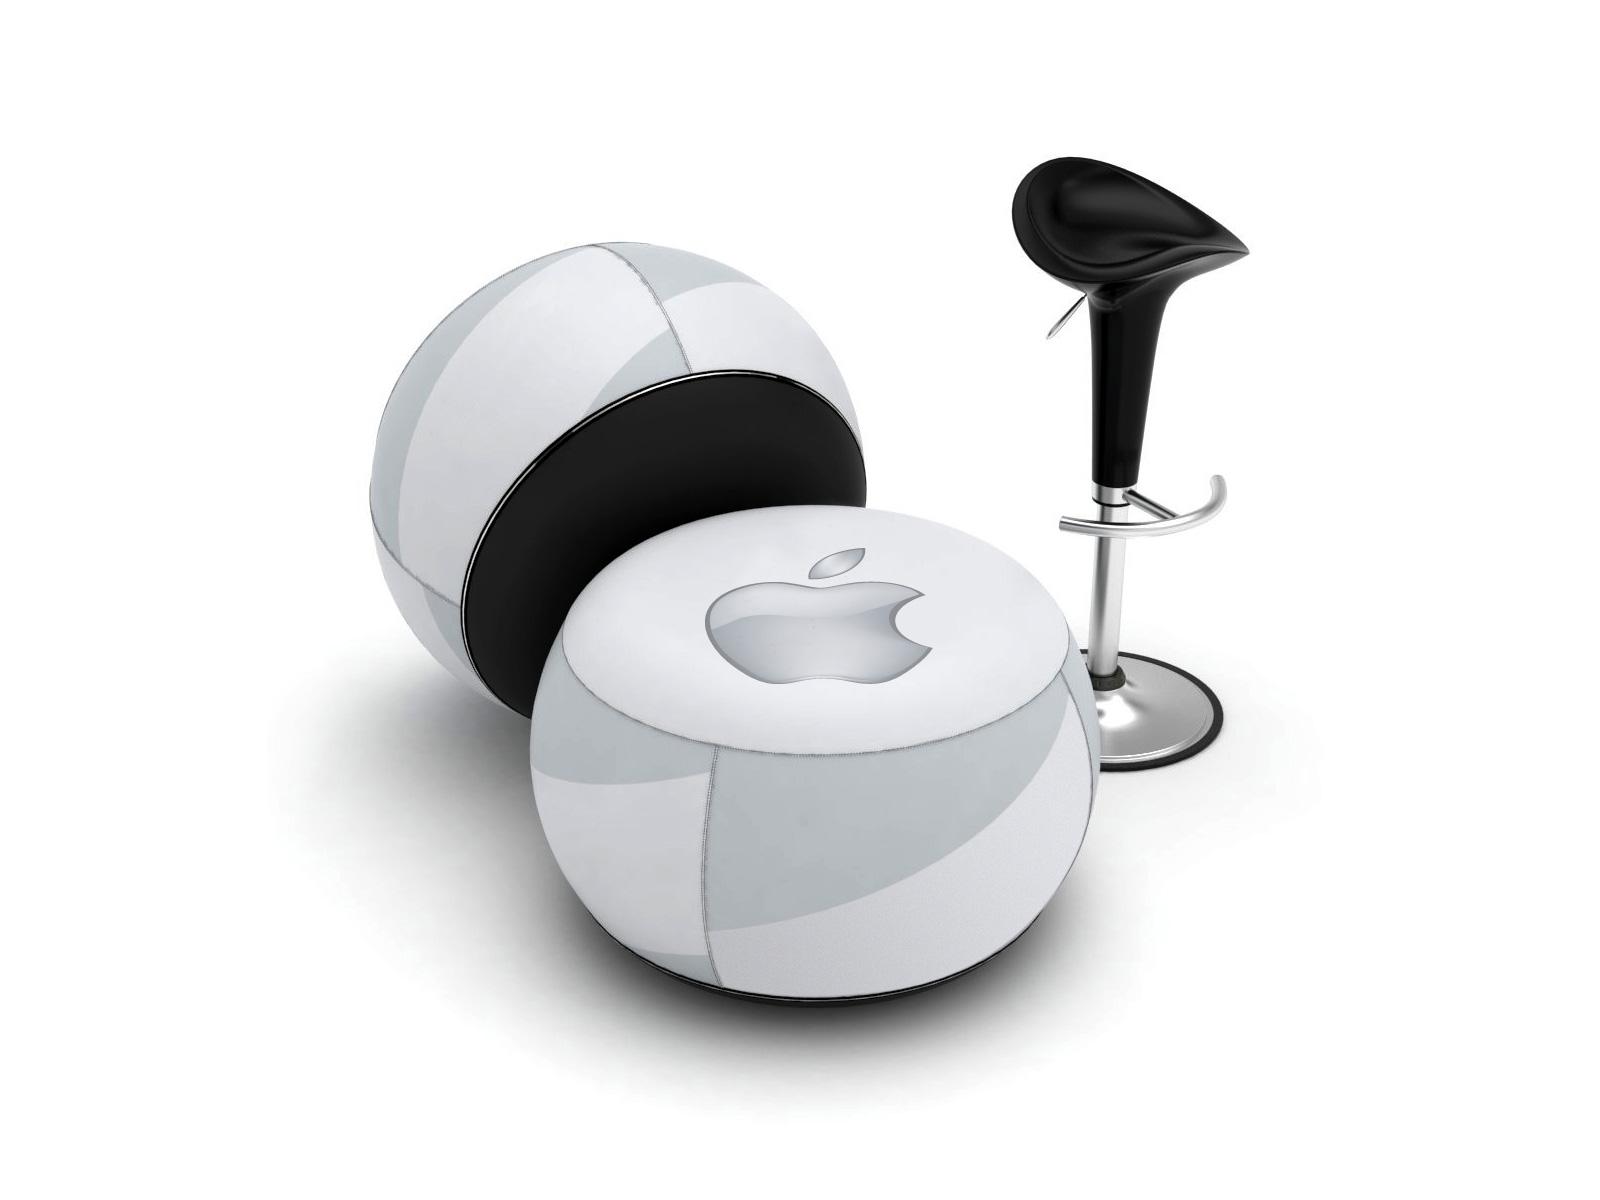 mobilier gonflable pouf mobilier d coration expoz. Black Bedroom Furniture Sets. Home Design Ideas